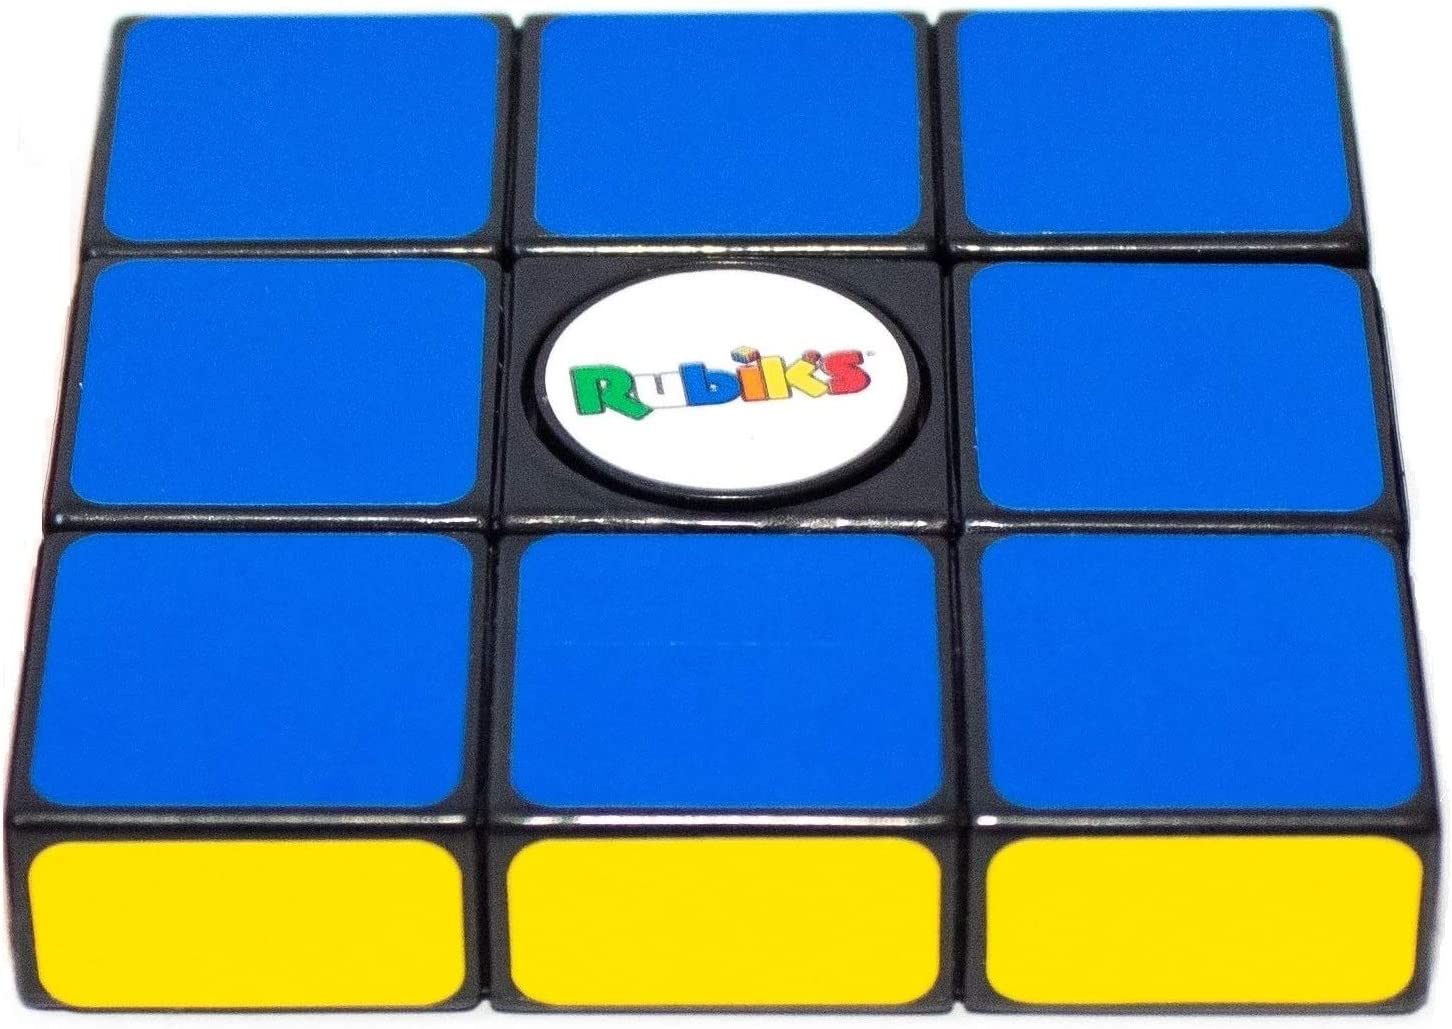 Rubik's-Spin-Block/